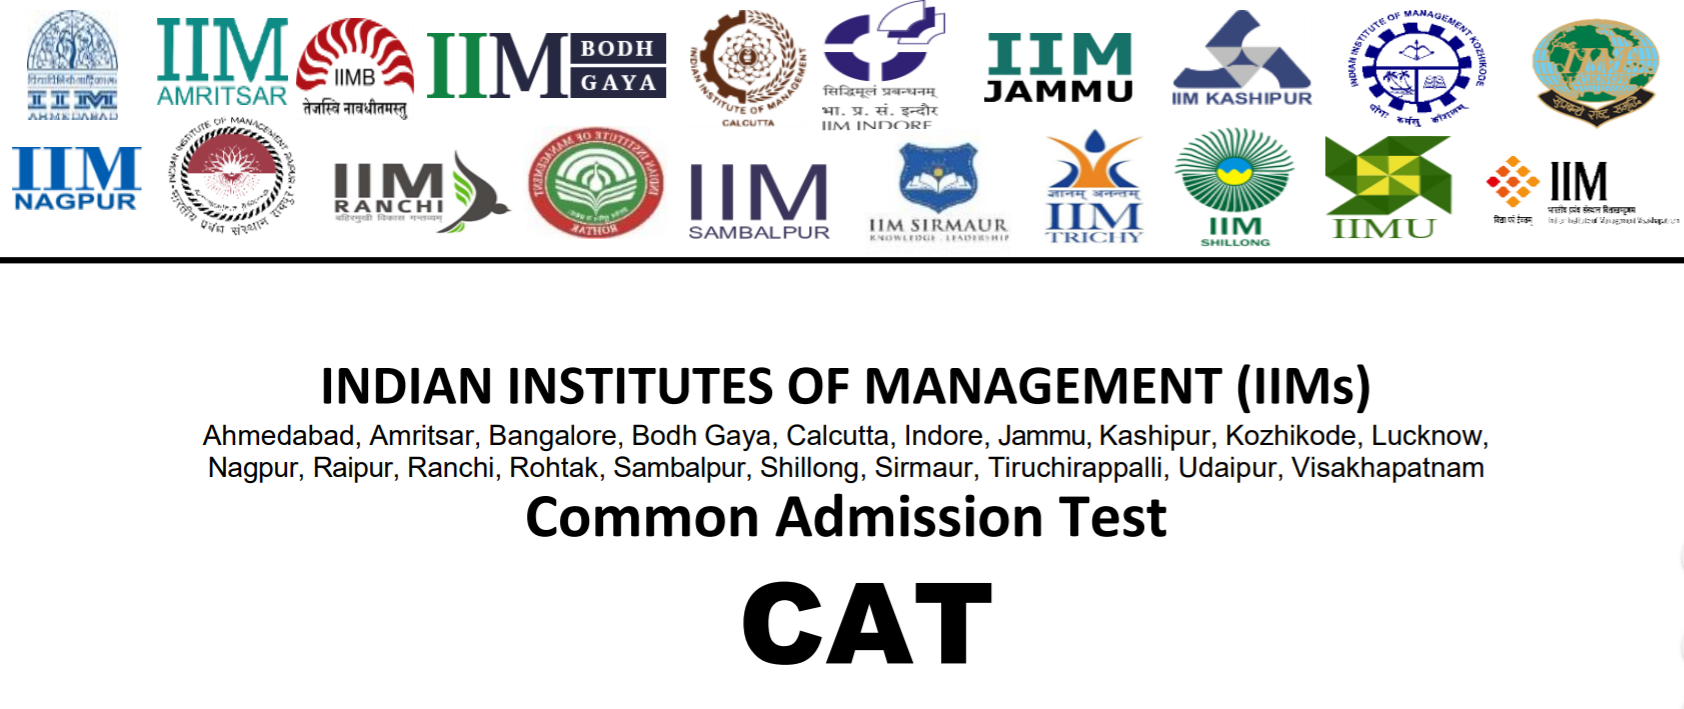 CAT 2019 Registration, Application Form, Exam Dates, Pattern, Syllabus, Last Date